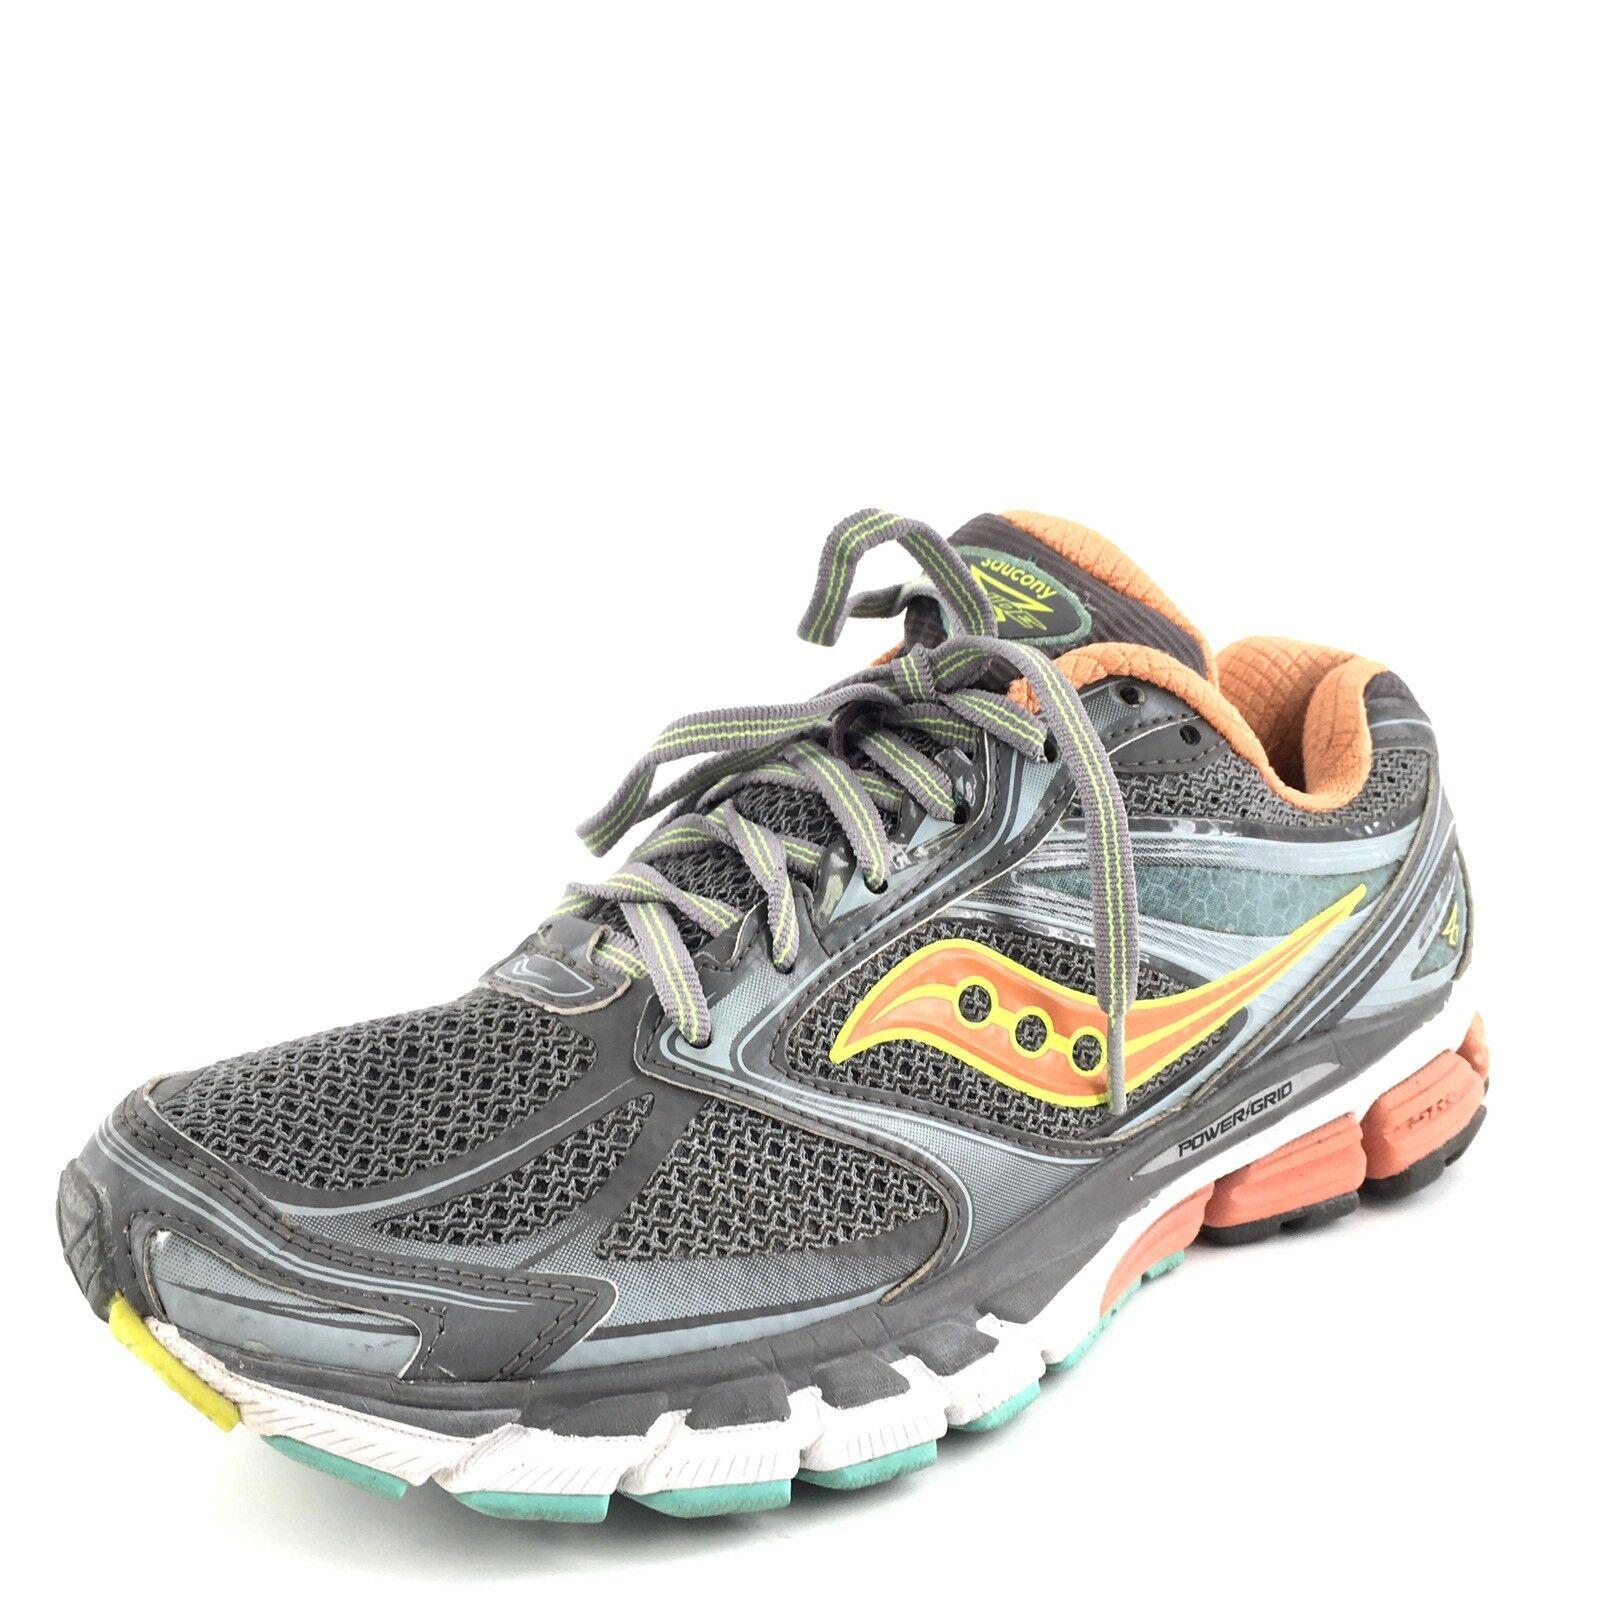 Saucony Guide 8 gris Atardecer Citron para mujer mujer mujer zapatos deportivos atléticos tamaño 10 M   solo para ti